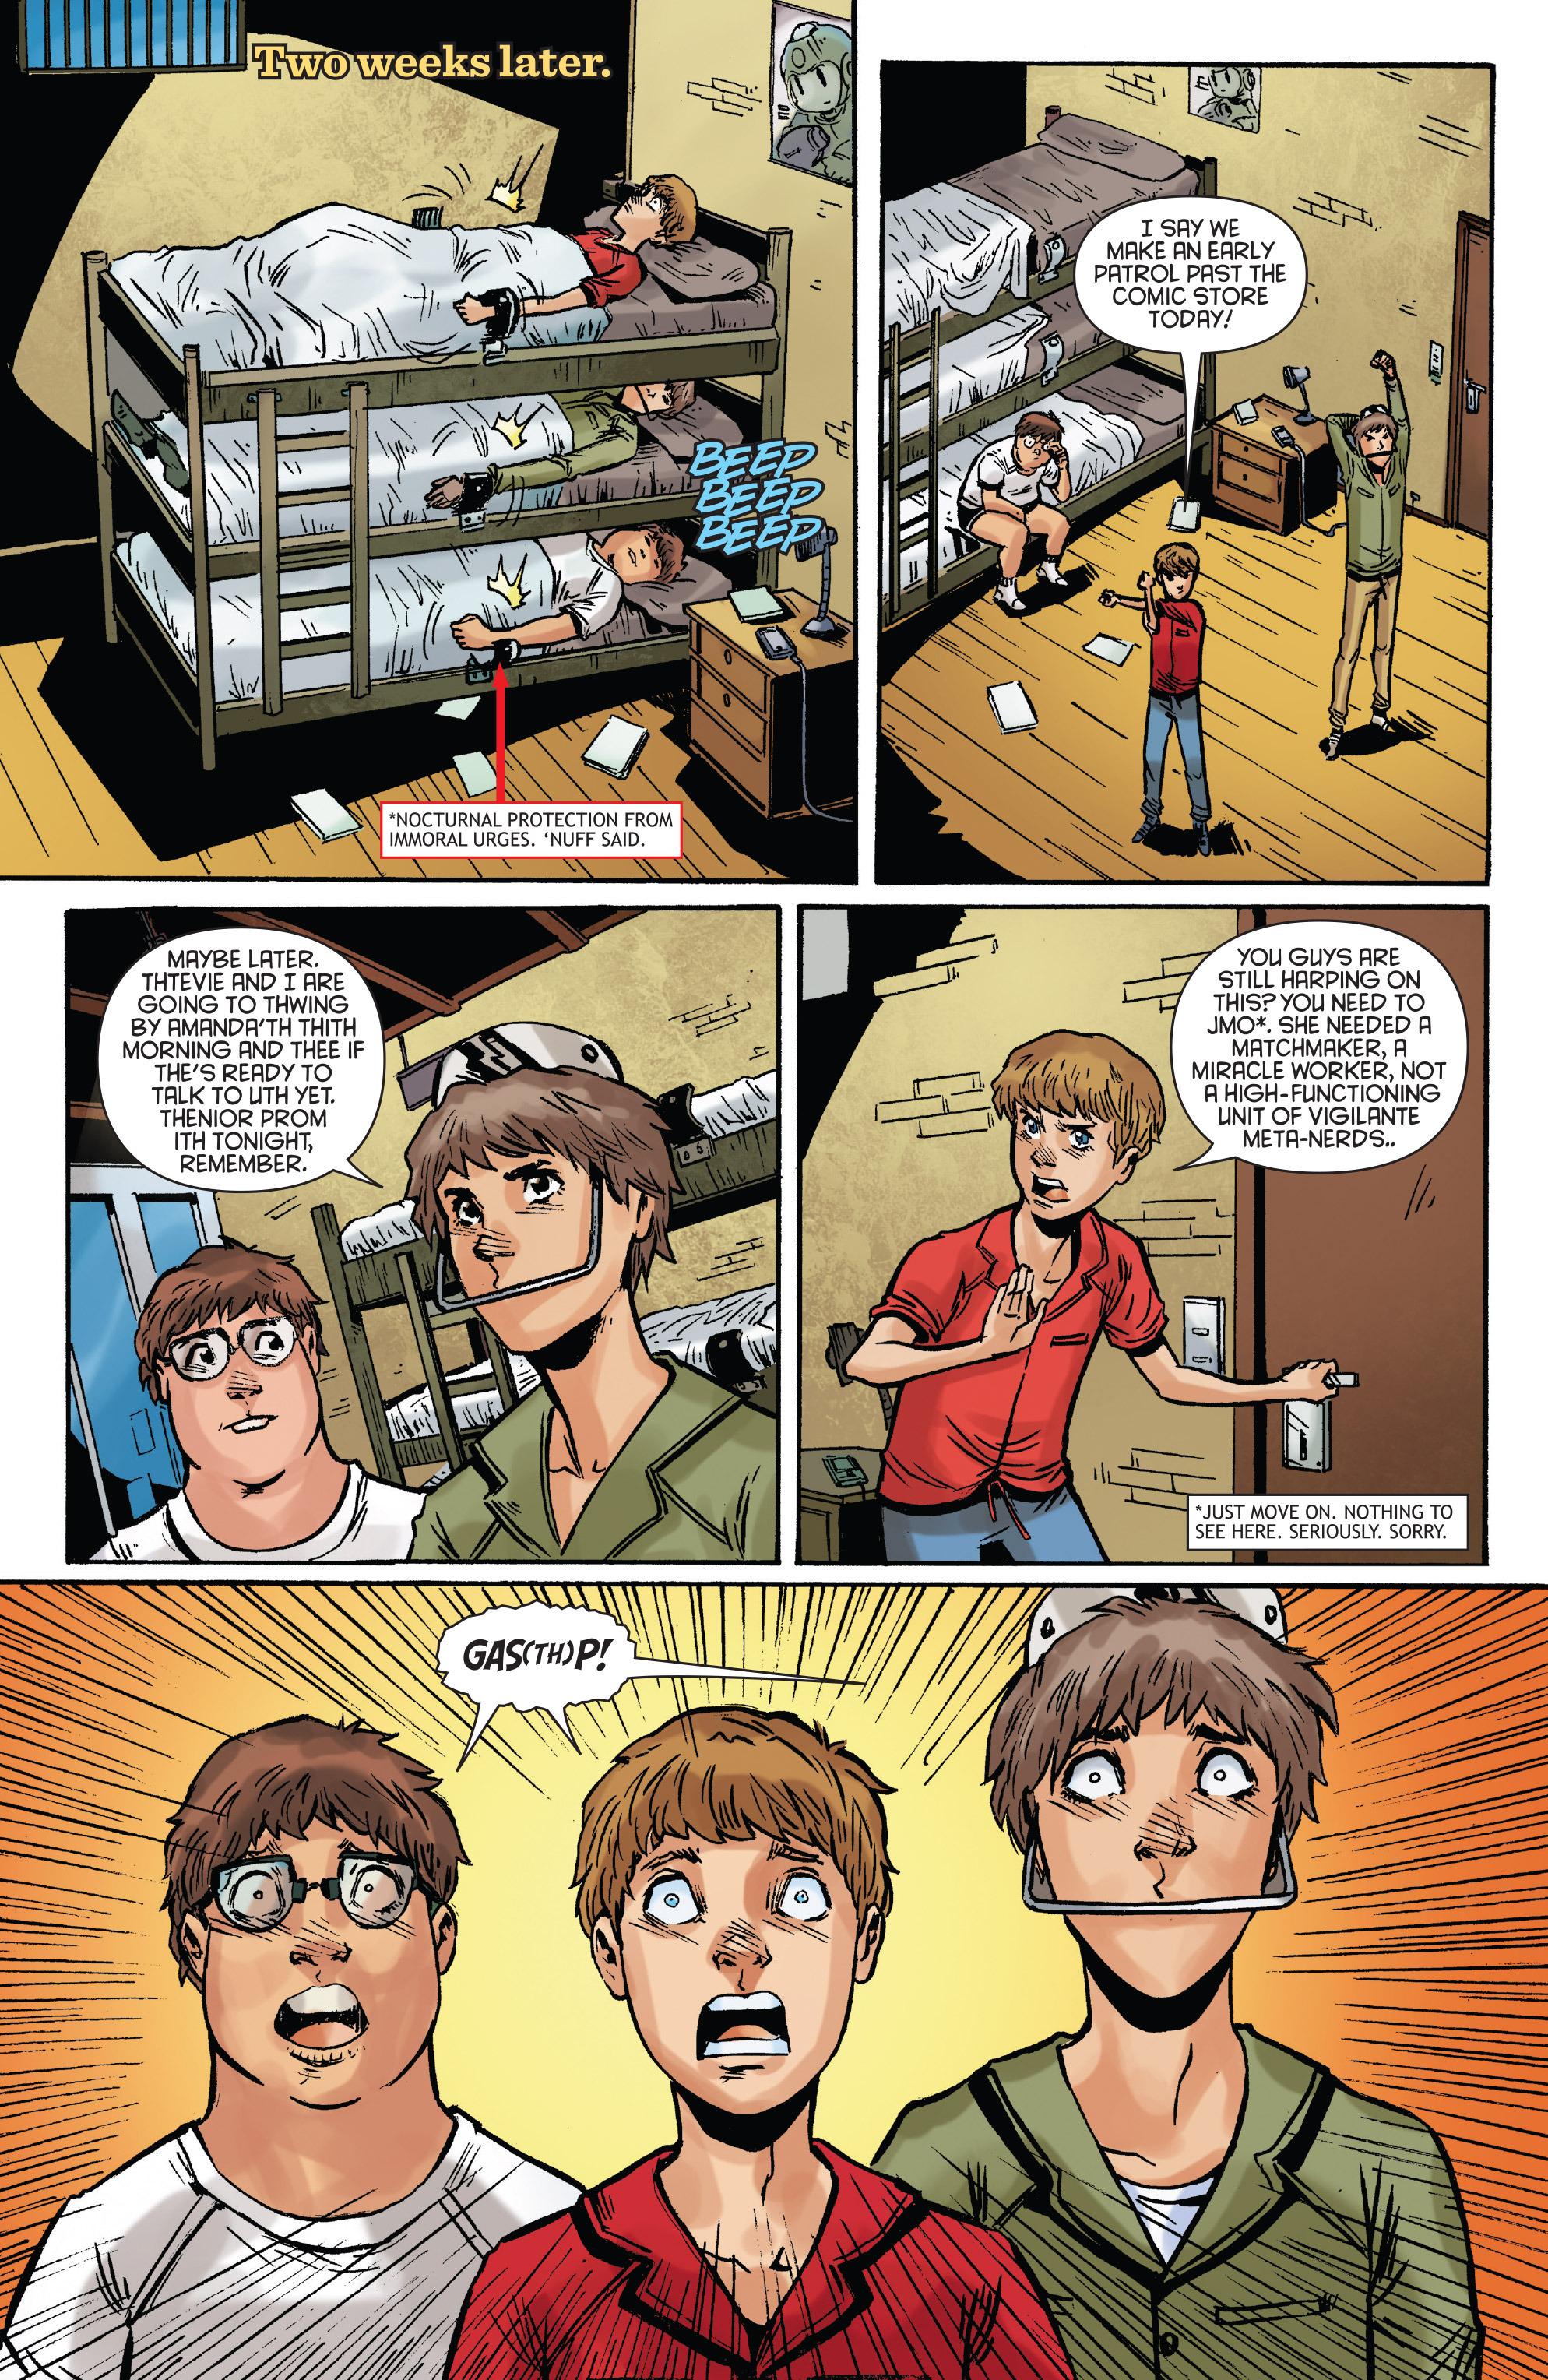 Read online Smosh comic -  Issue #2 - 14